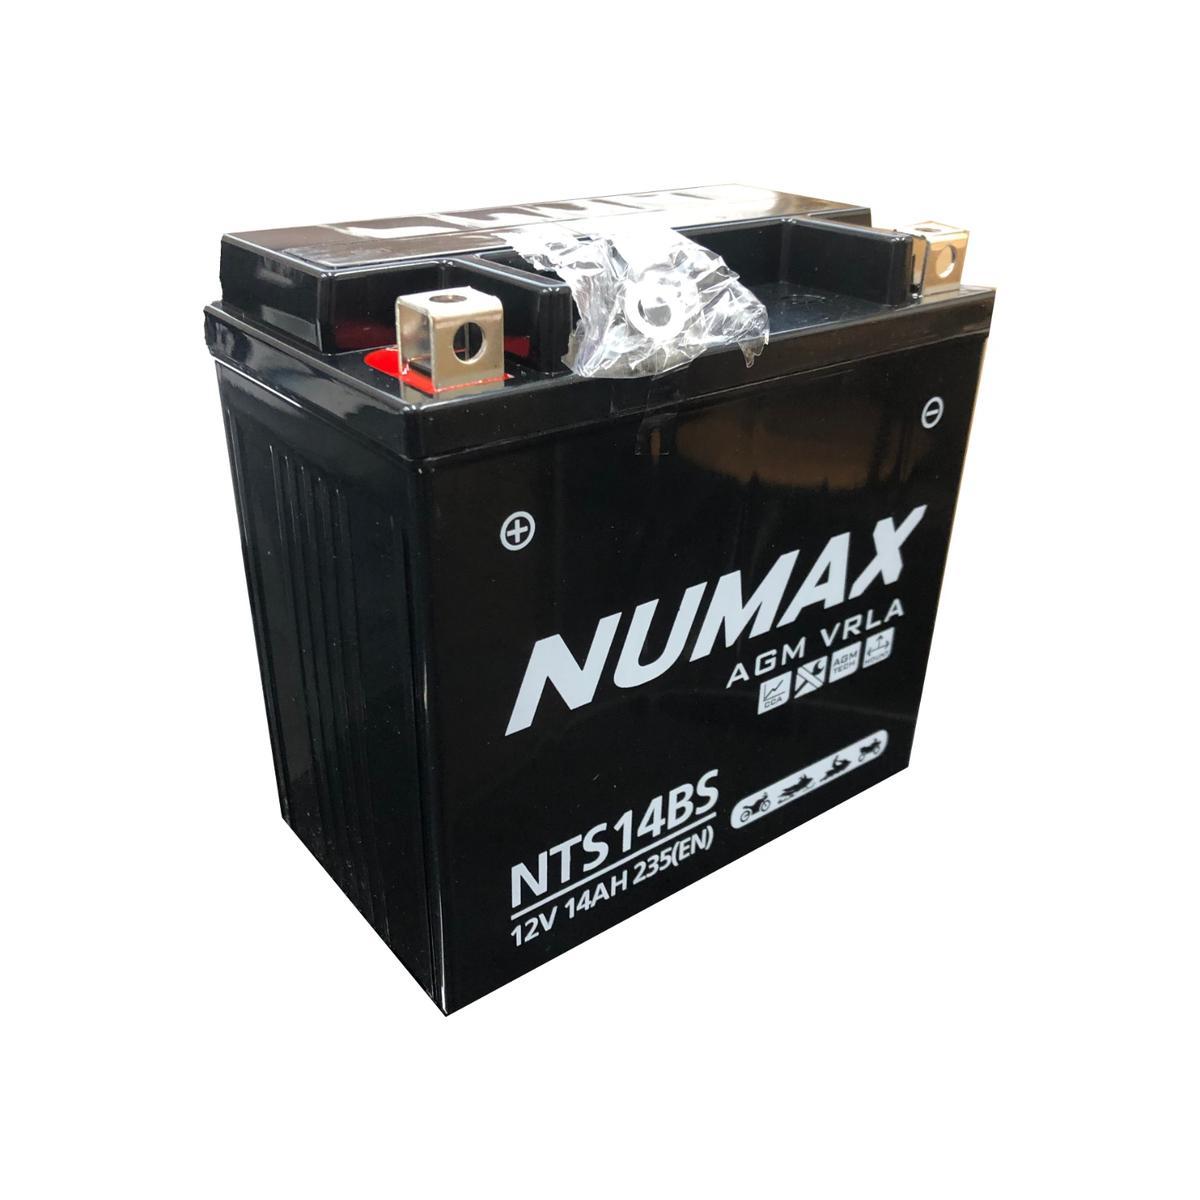 Numax NTS14BS 12v Motorbike Bike Battery KAWASAKI 800cc VN800 A YTX14-4